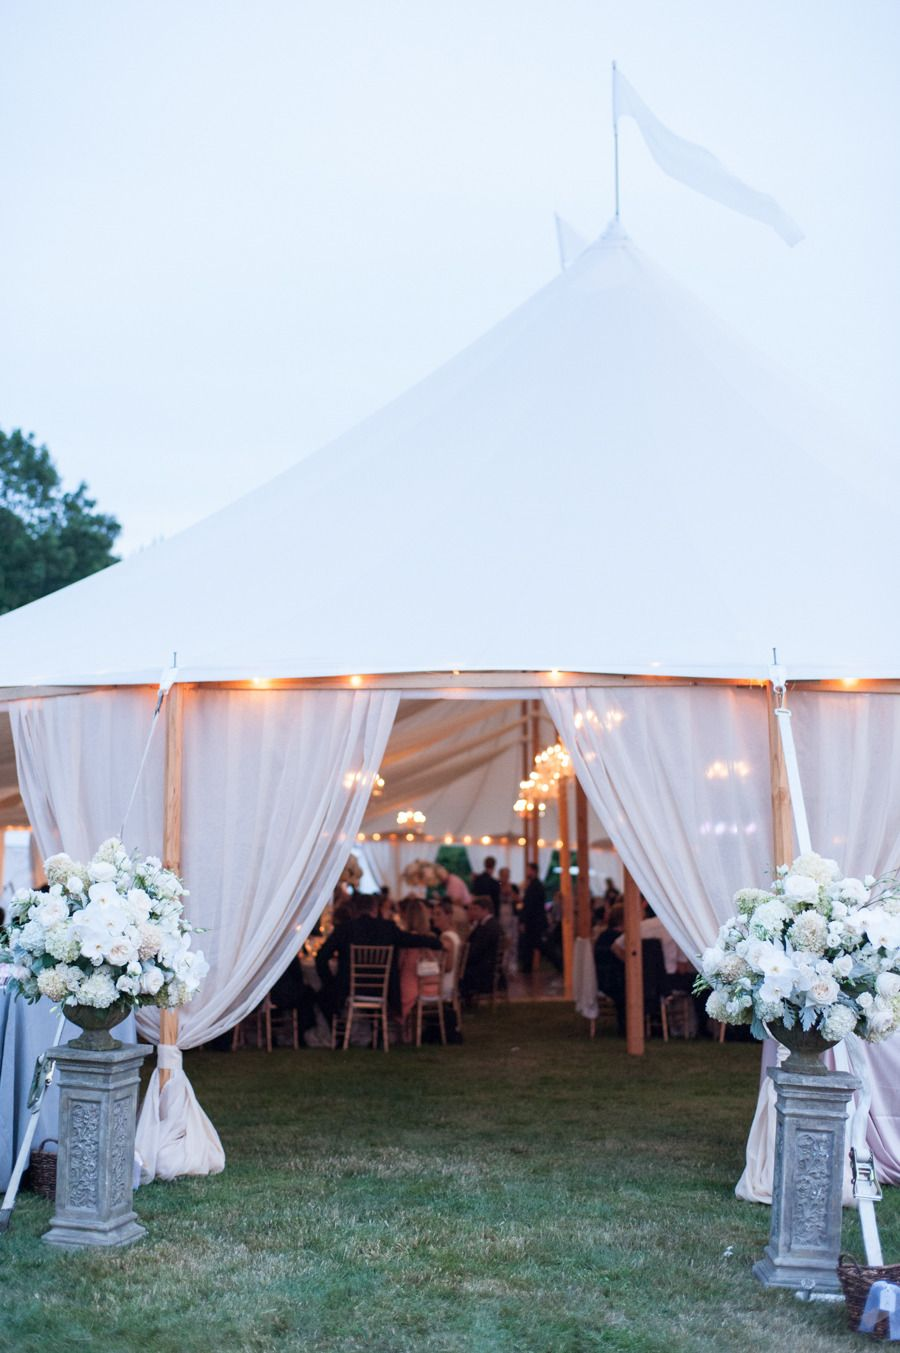 Wedding tent decoration images  Elegant Jamestown Summer Wedding  wedding ideas  Pinterest  Boda